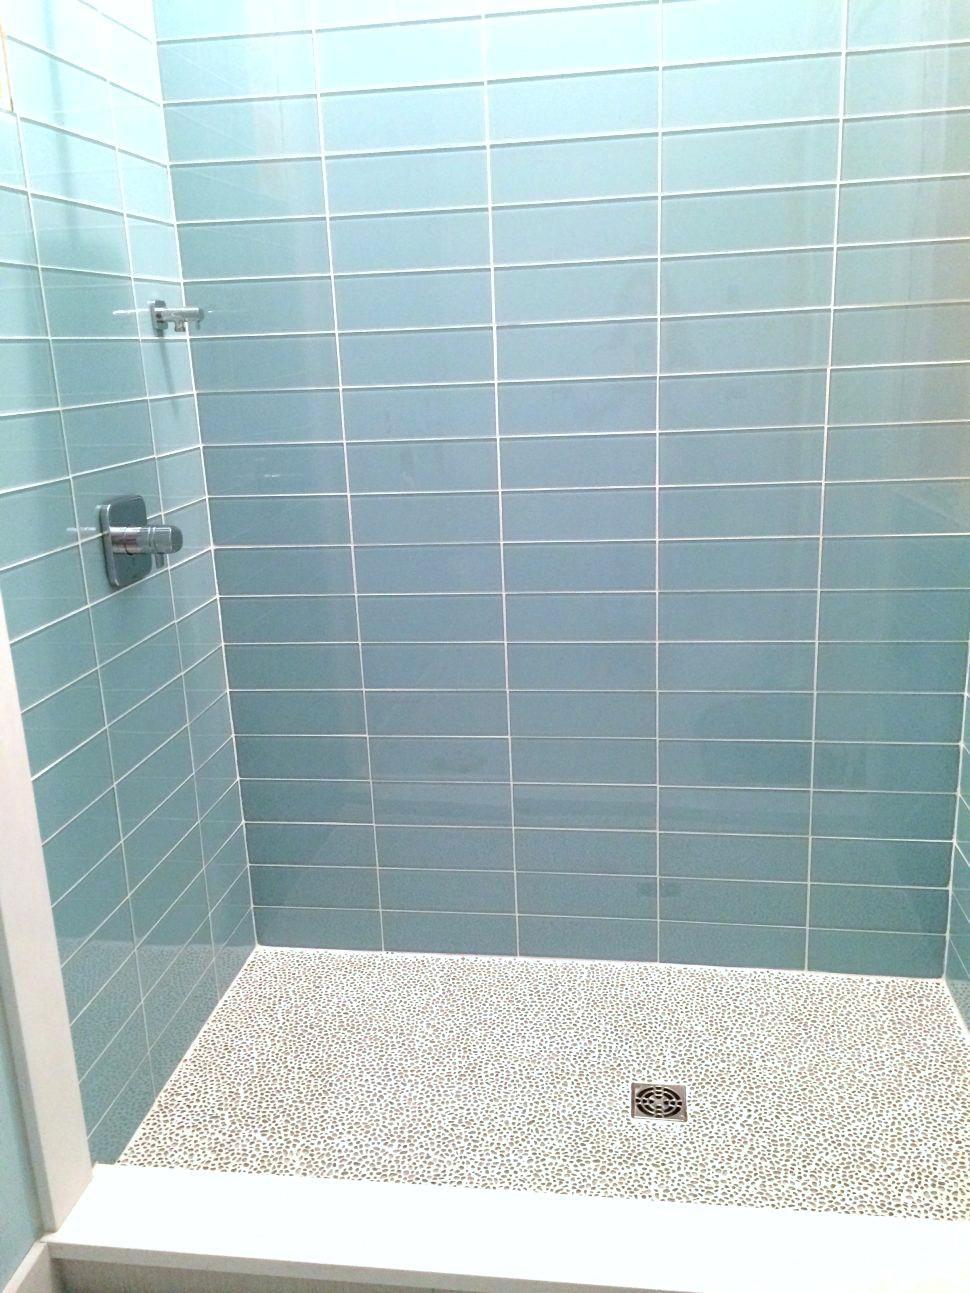 Lightay Bathroom Tile Backsplash Bathrooms Design Blue Subway Metal ...